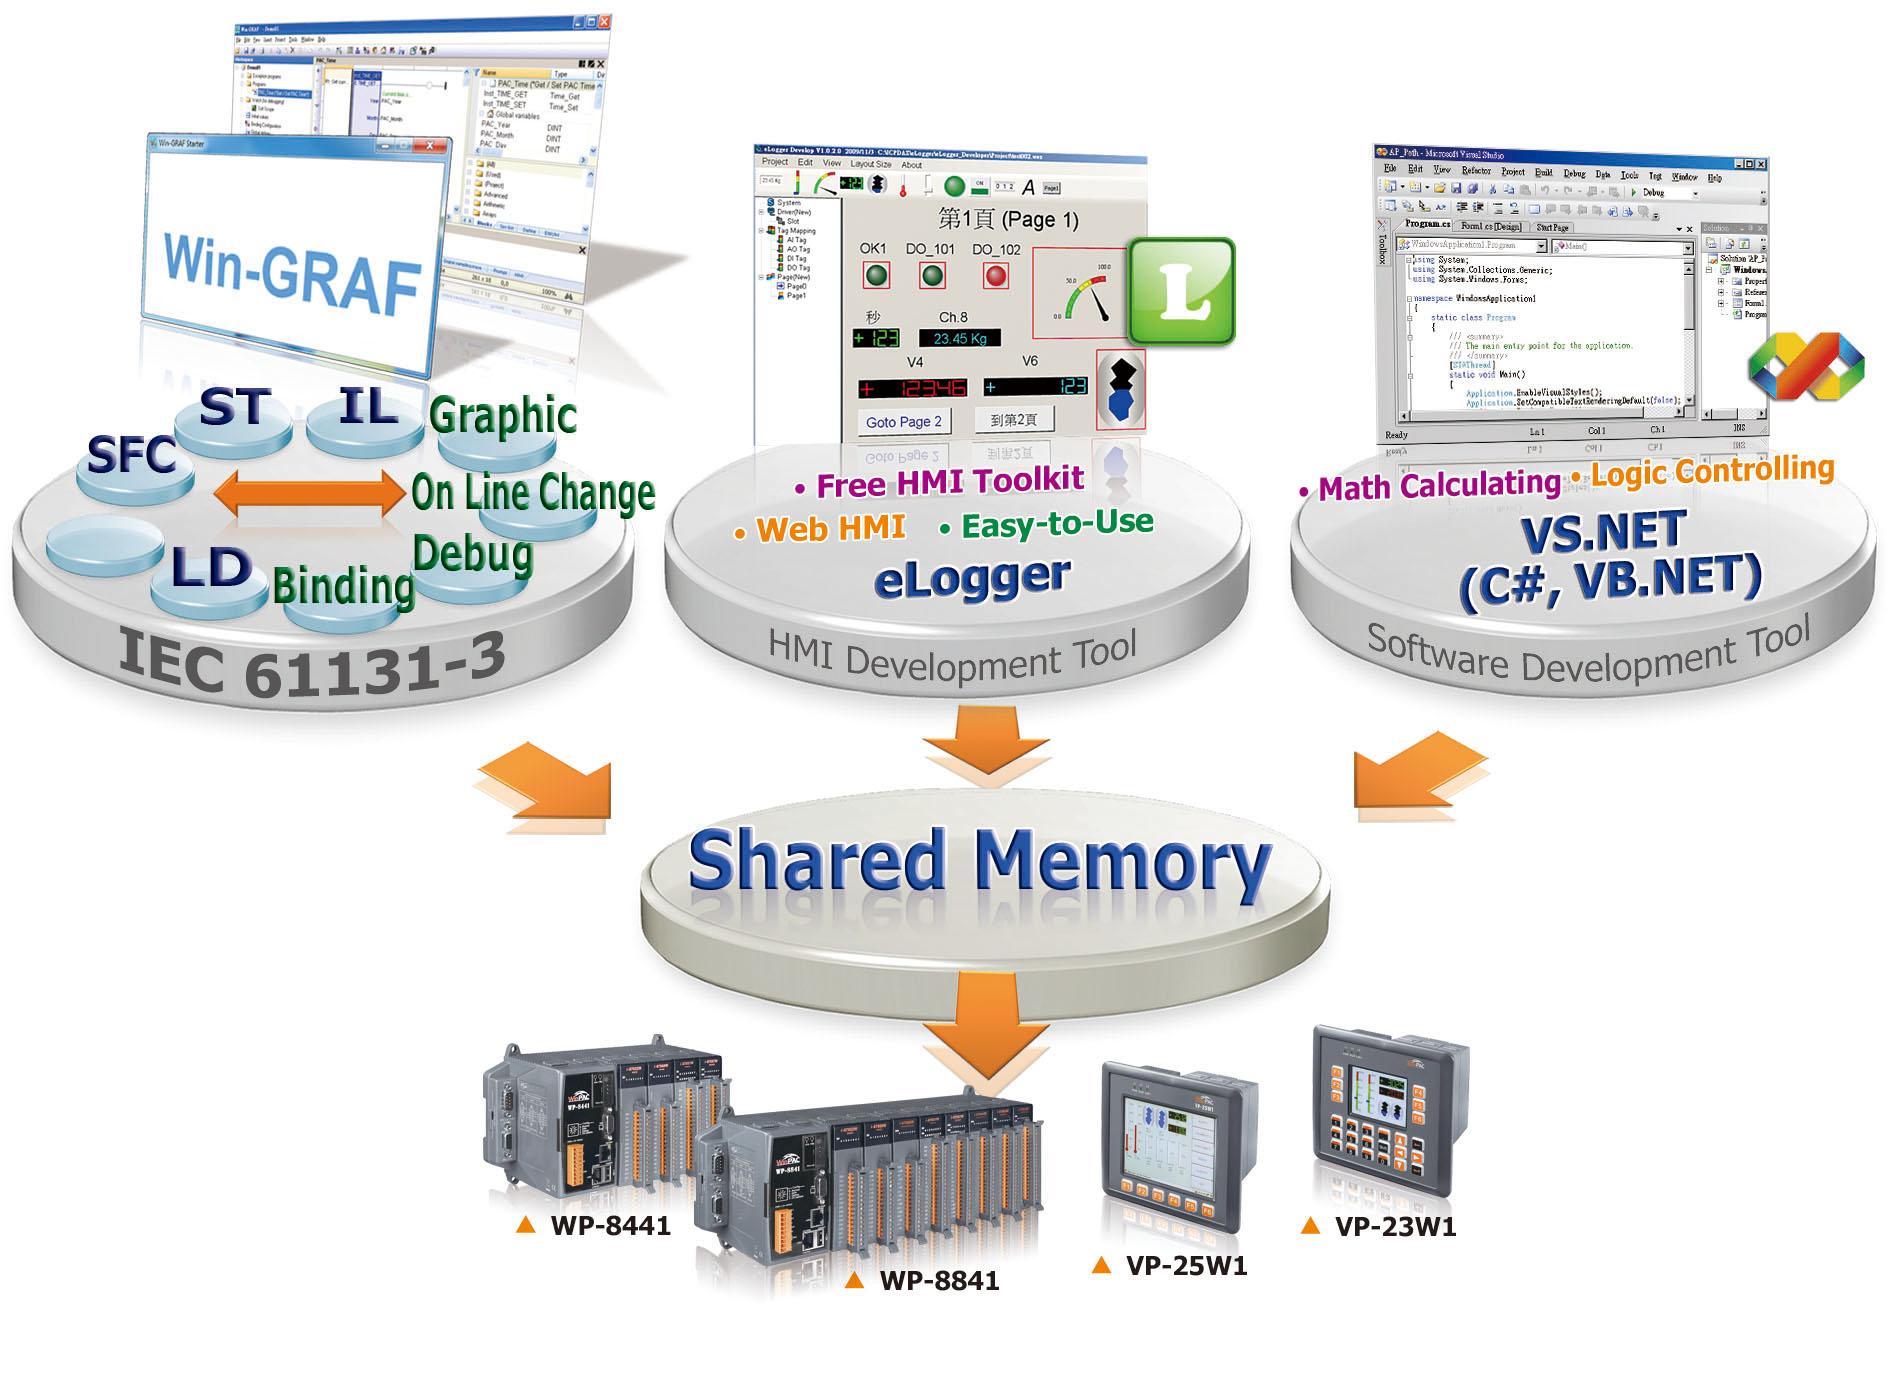 home > product> solutions > software > SCADA/HMI > eLogger